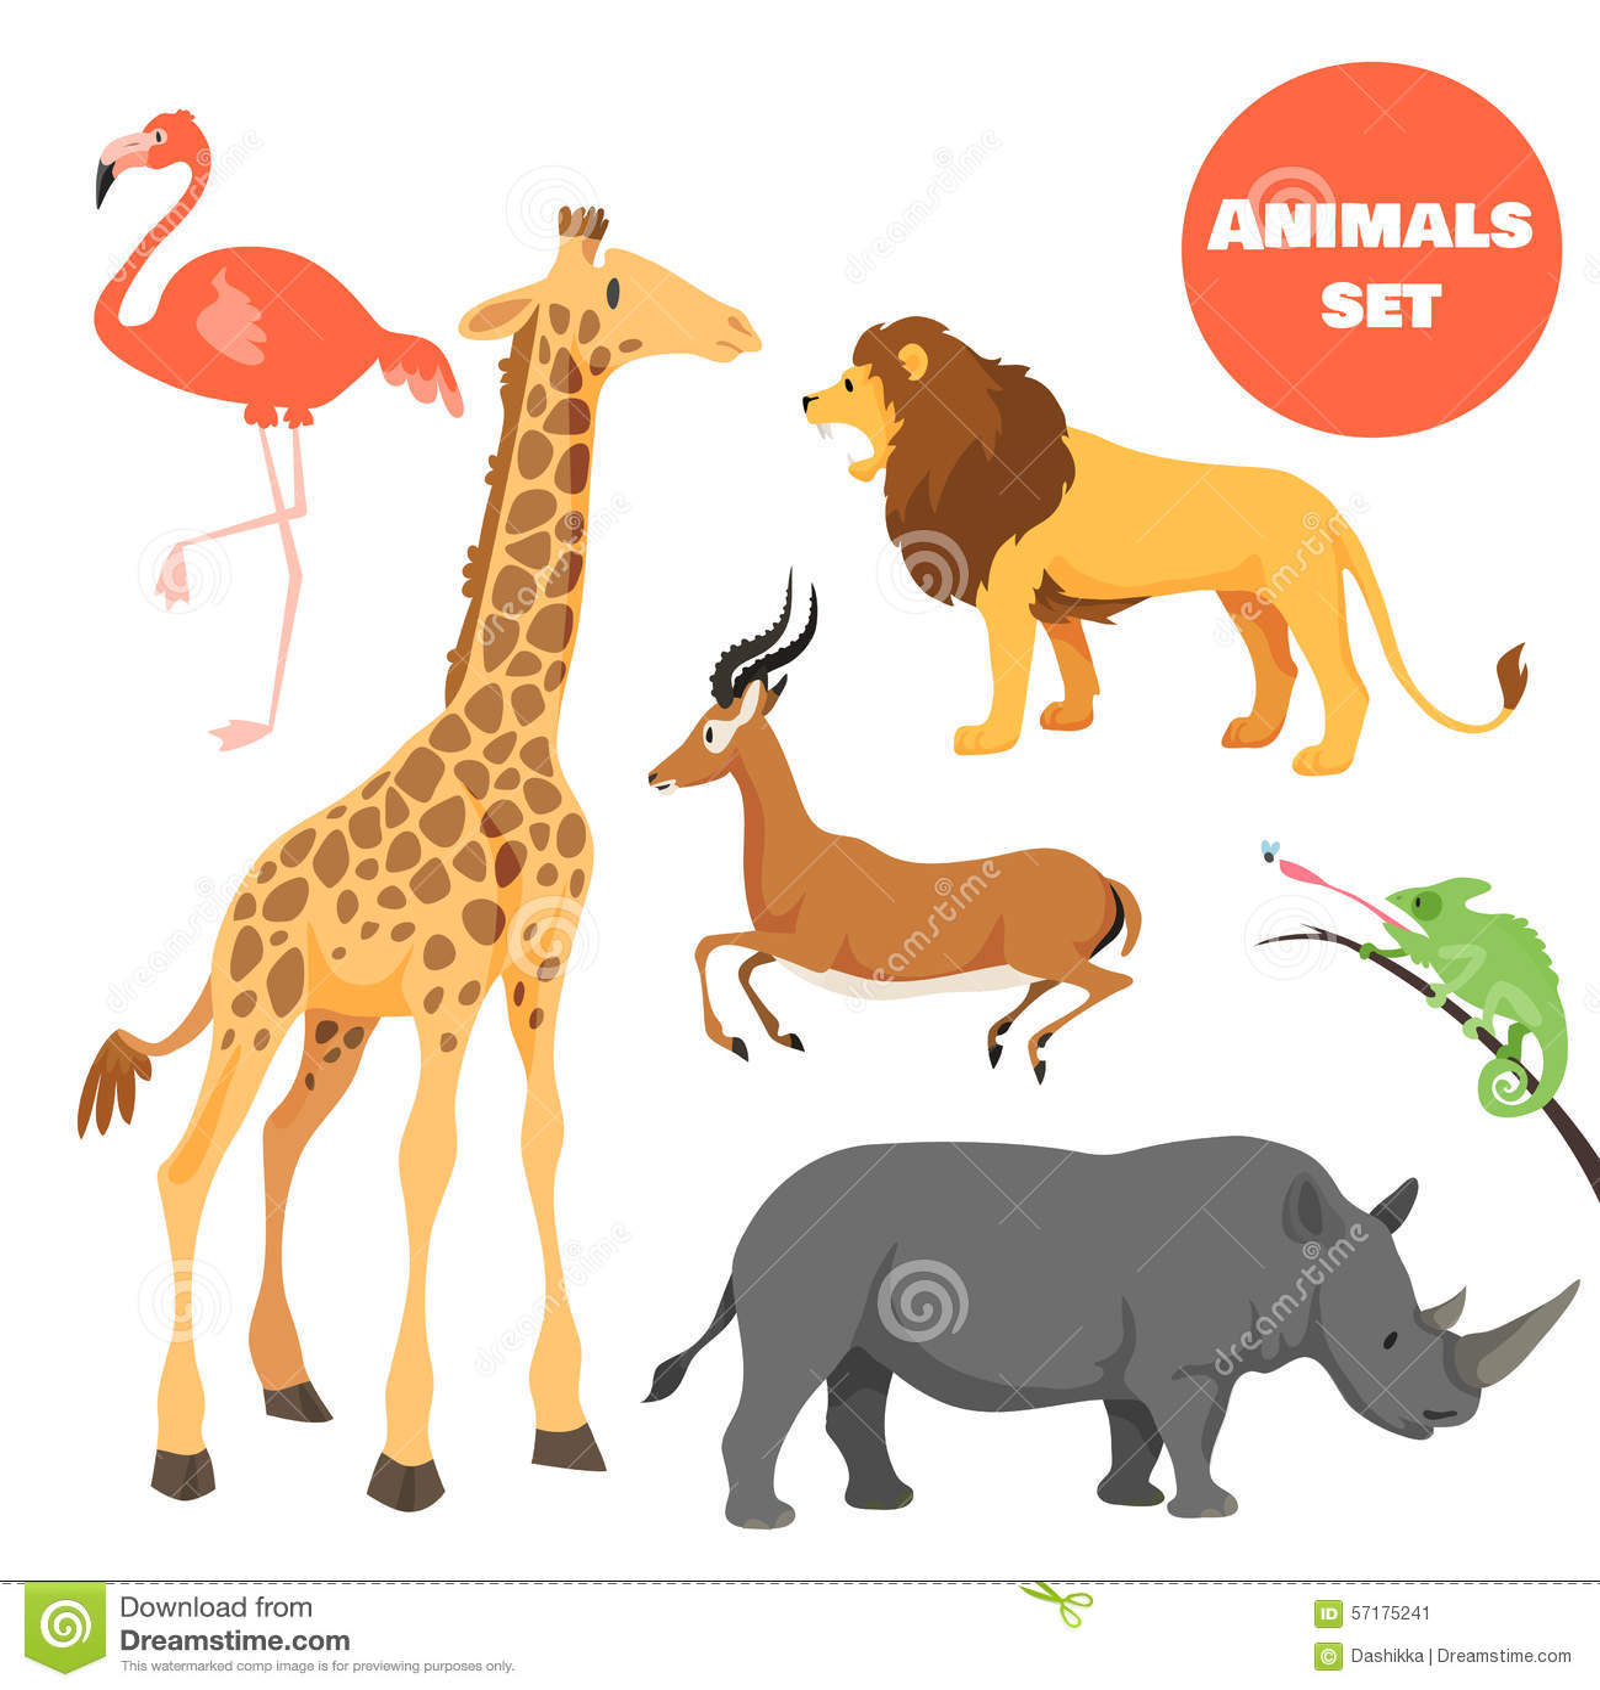 Animals cartoon for kids